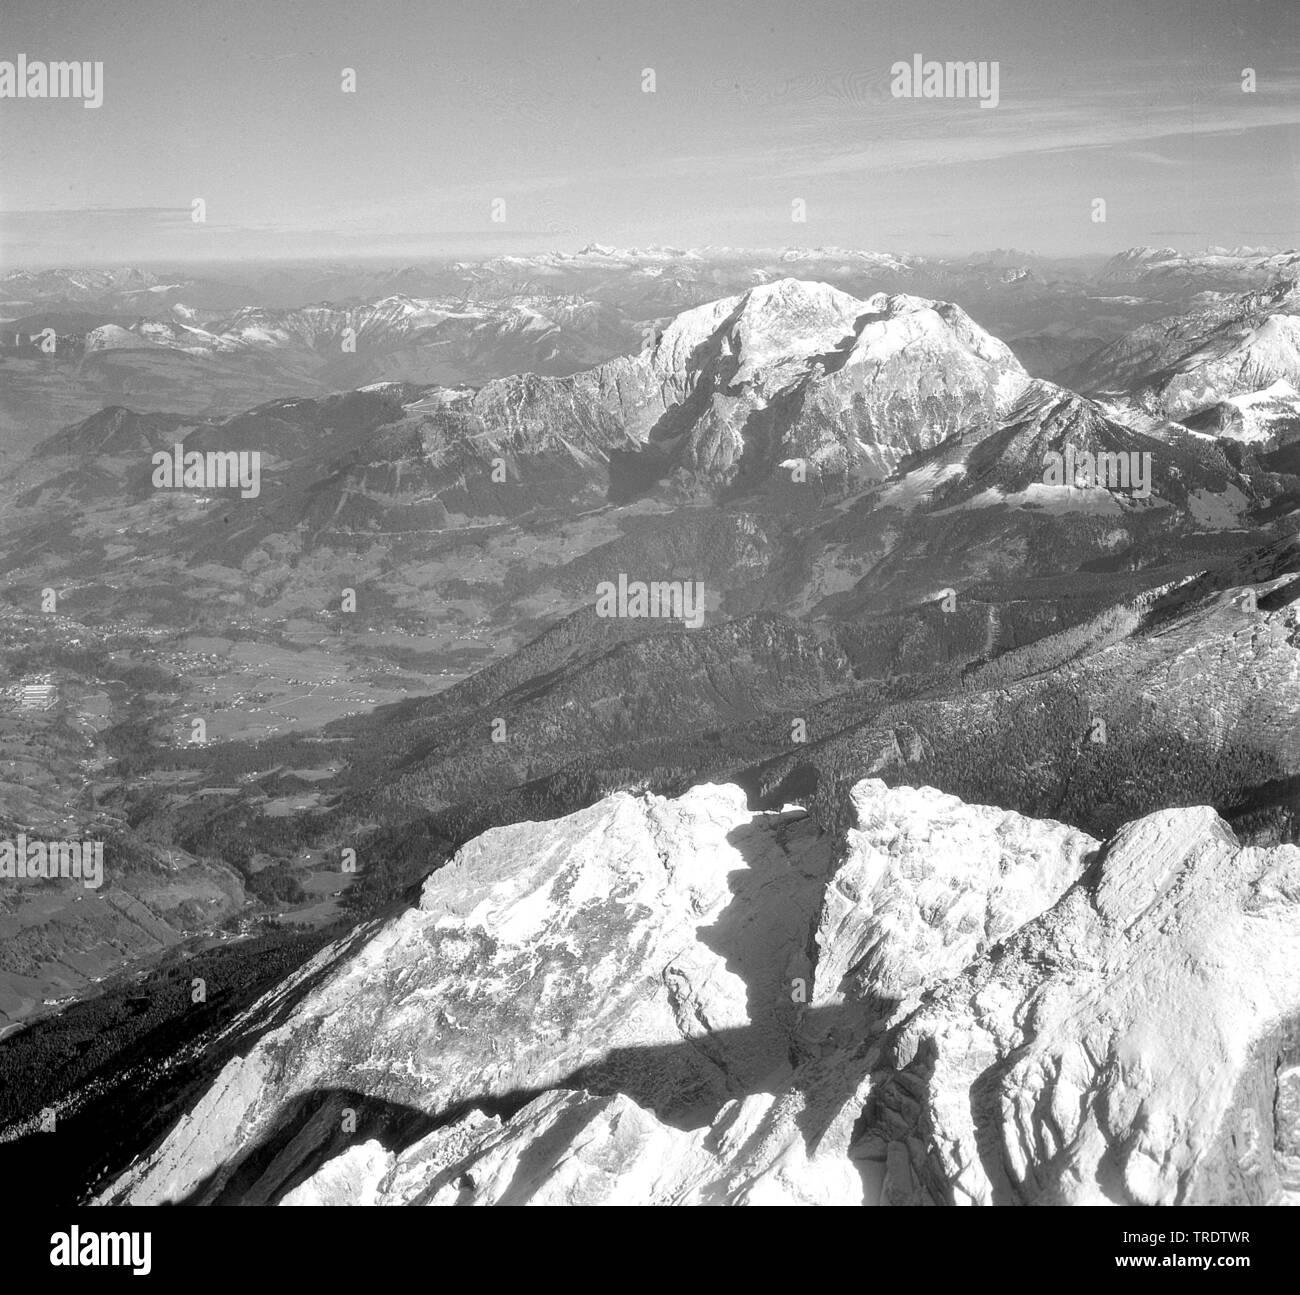 Obersalzberg, aerial photo, taking between 1958 and 1963, Germany, Bavaria, Oberbayern, Upper Bavaria - Stock Image